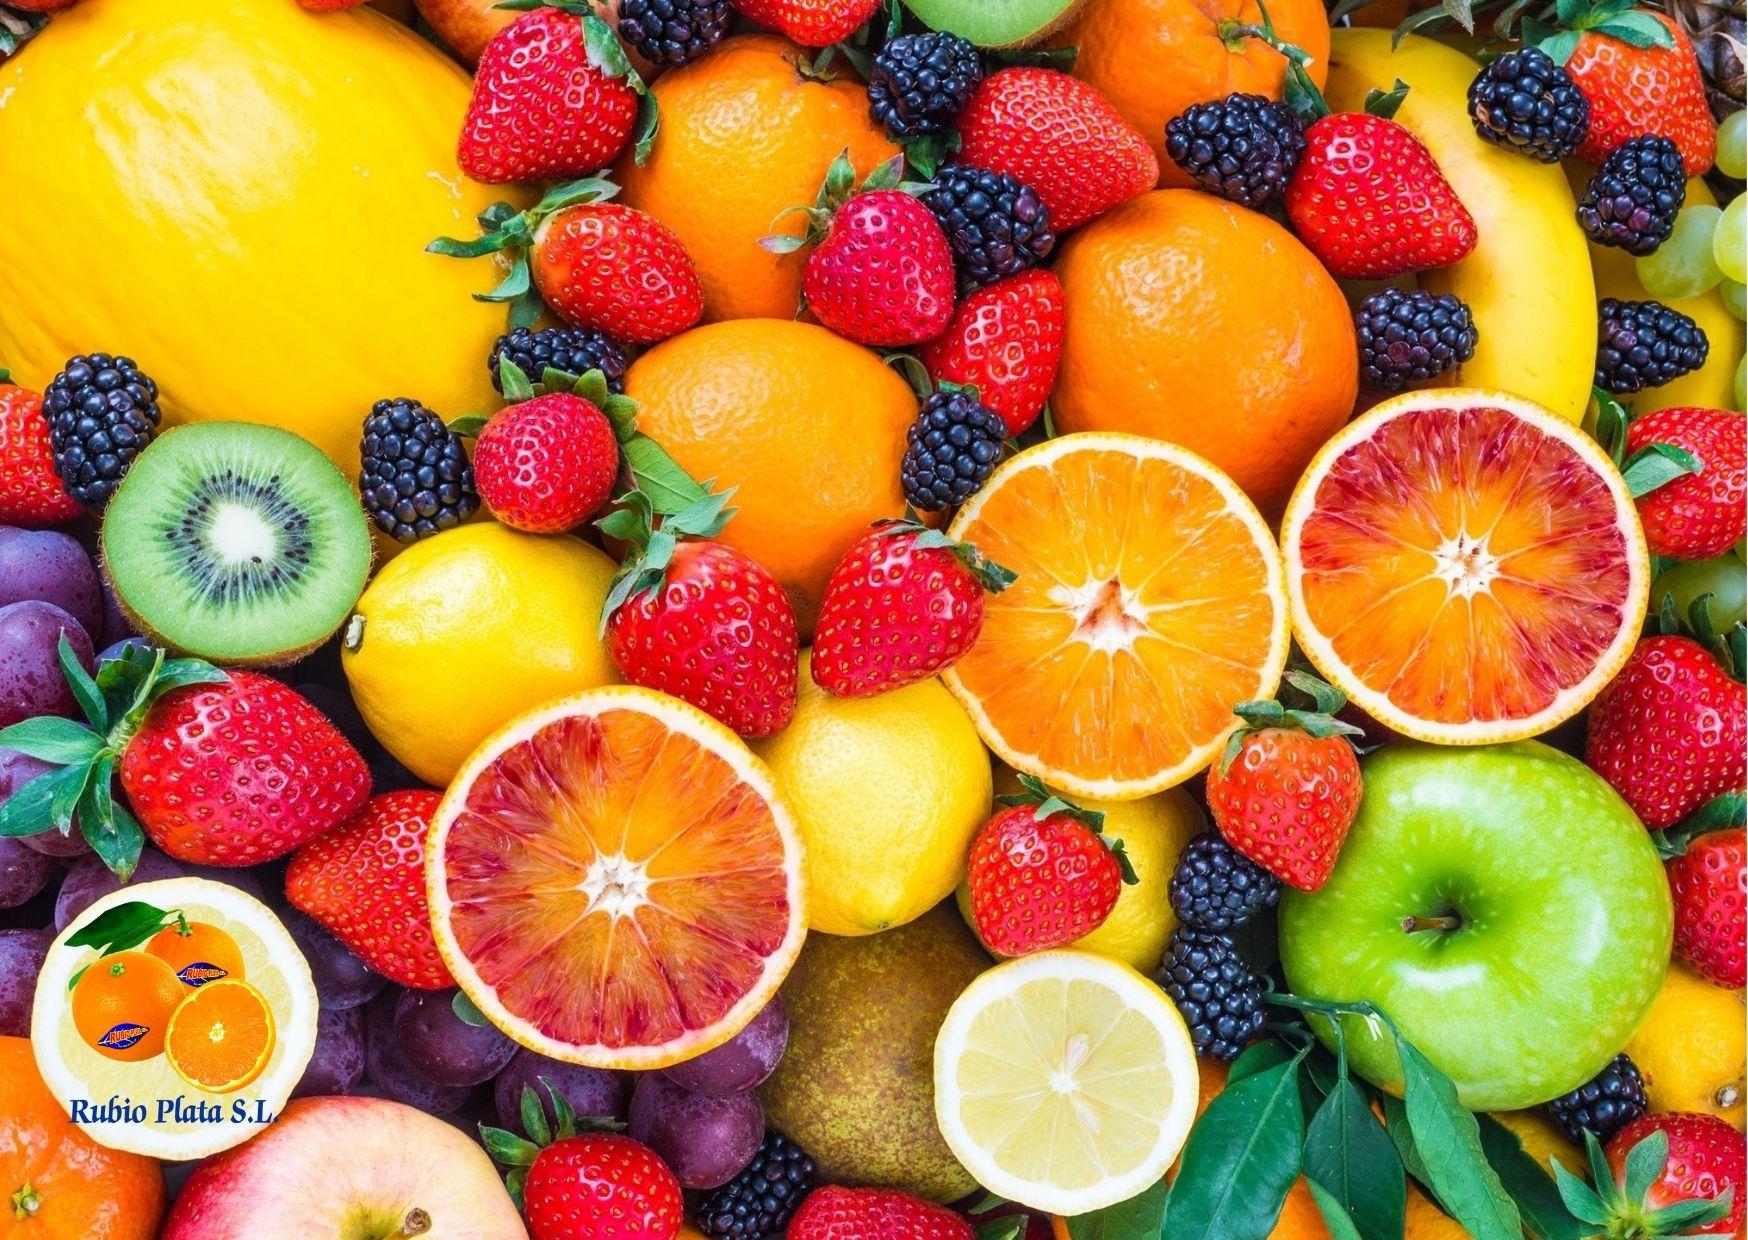 Mejores frutas para prevenir la gripe